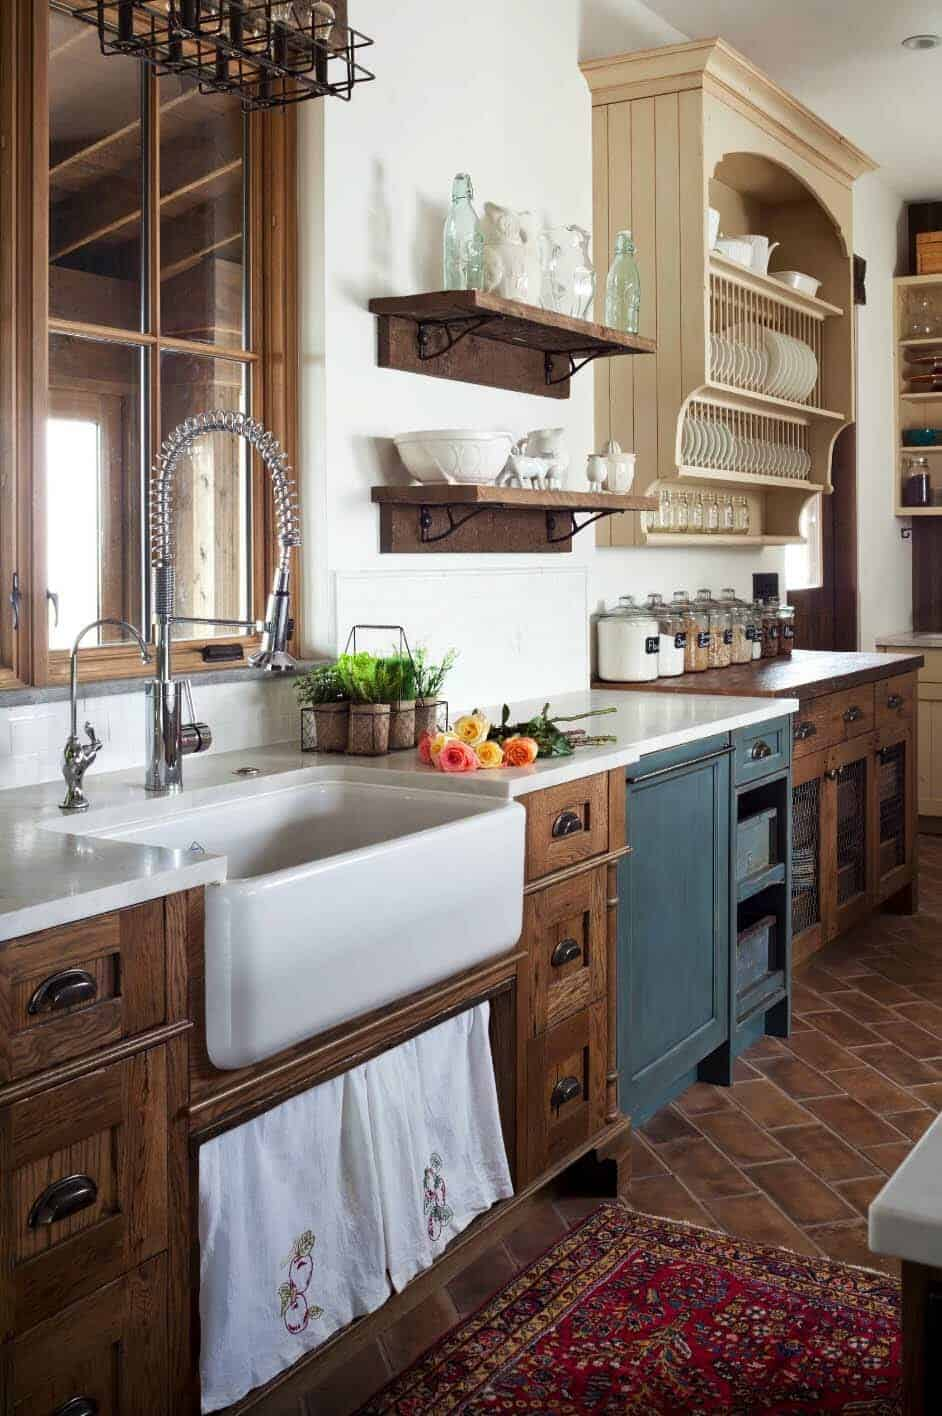 35+ Amazingly creative and stylish farmhouse kitchen ideas on Farm House Kitchen Ideas  id=26439